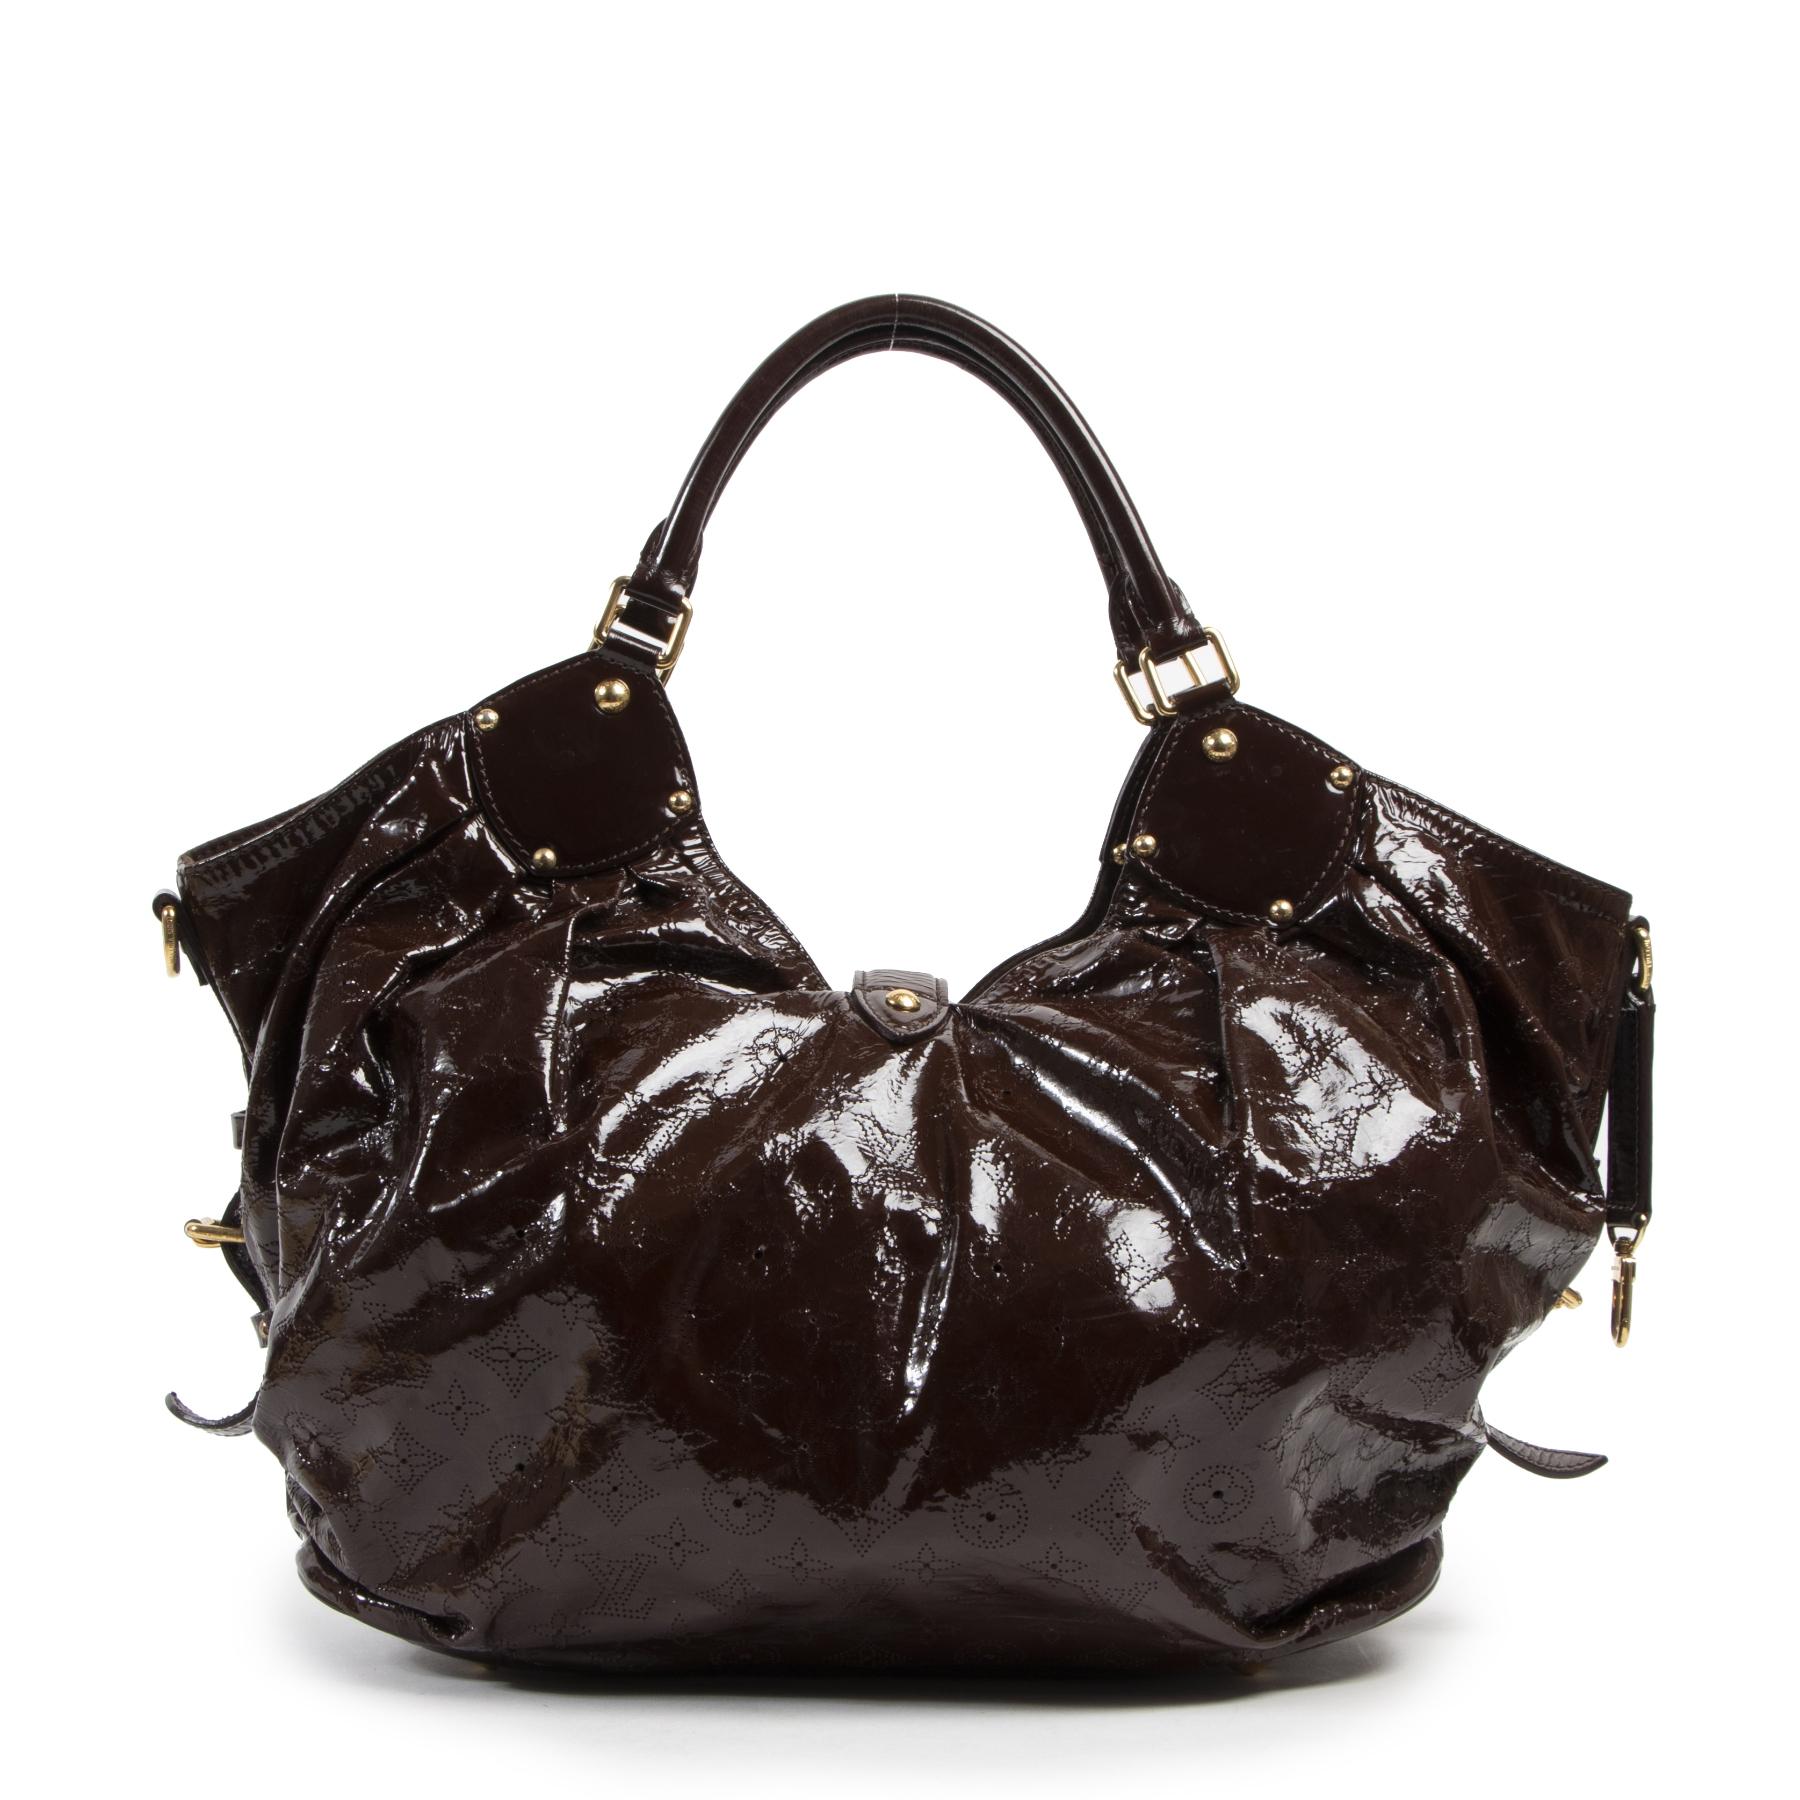 Authentic secondhand Louis Vuitton Brown Vernis Surya XL Bag designer bags fashion luxury vintage webshop safe secure online shopping designer high end brands